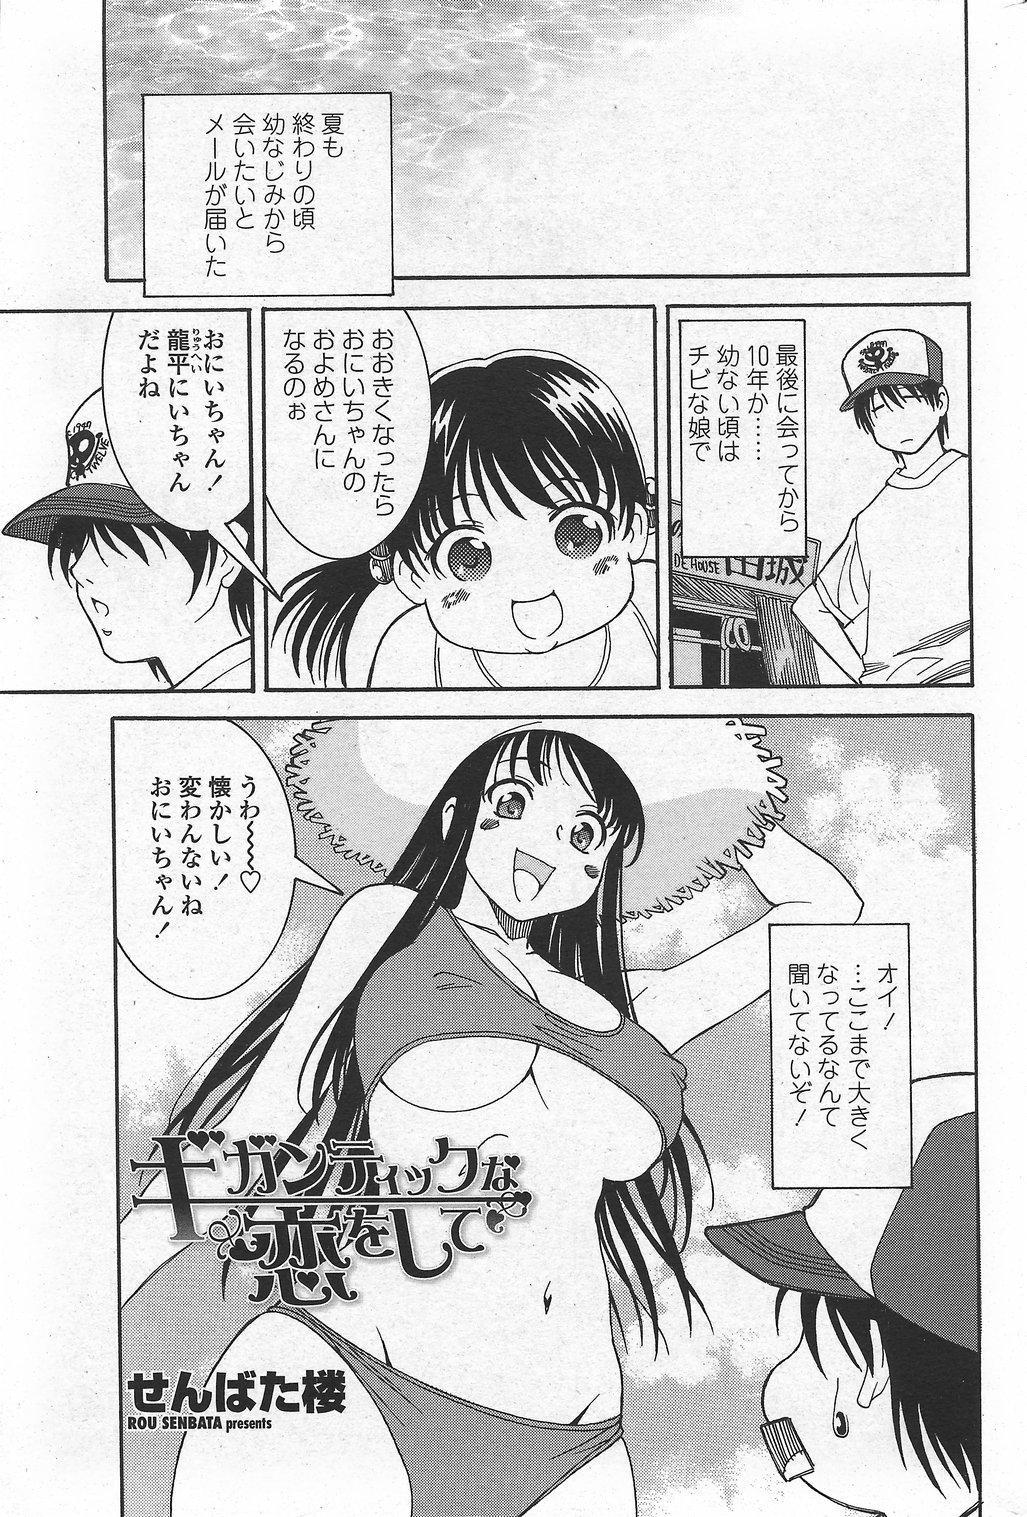 COMIC Penguin Club Sanzokuban 2007-10 Vol. 225 38